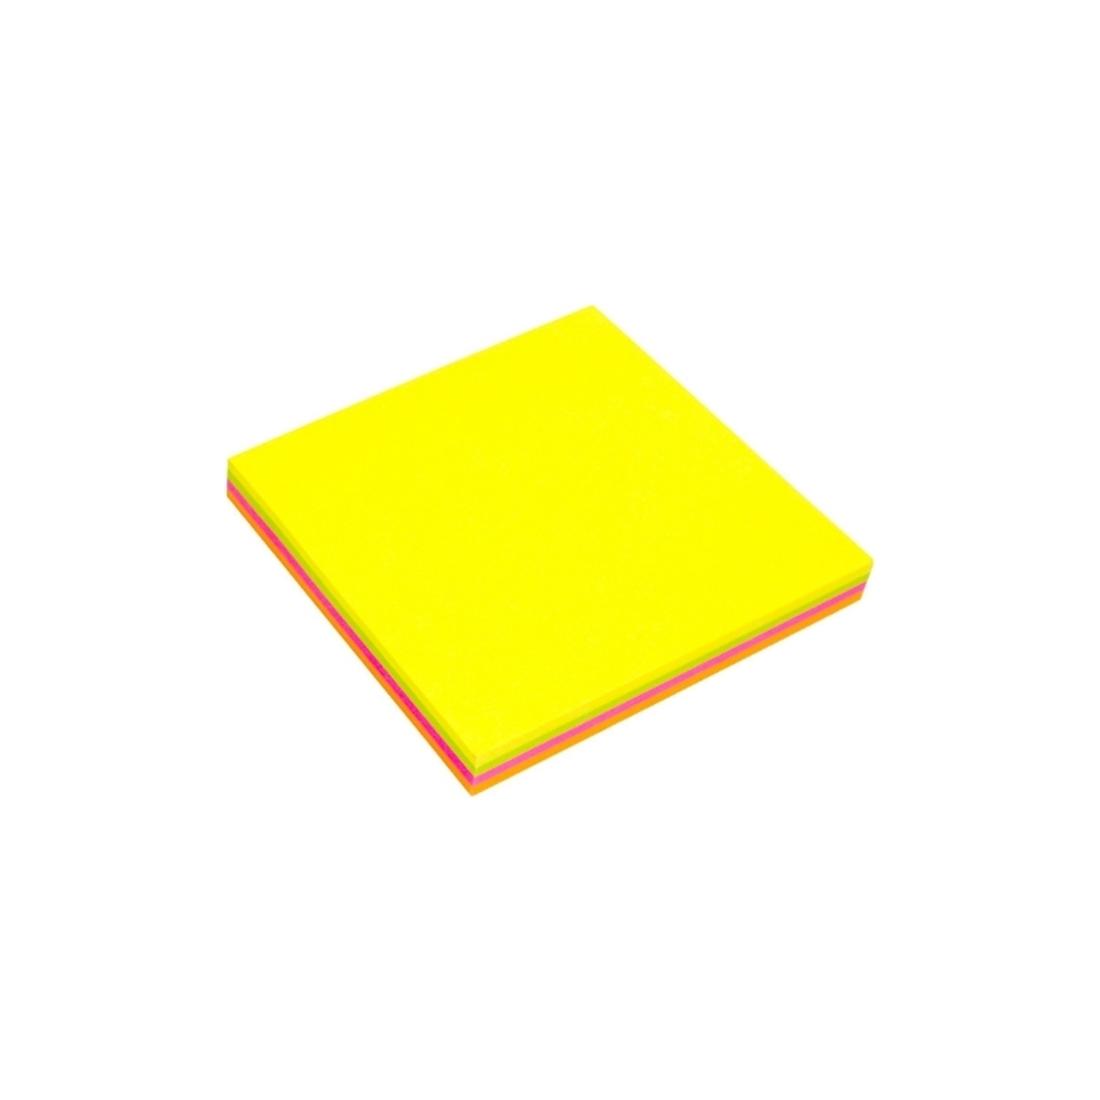 Slika za kategoriju Sticky notes i etikete